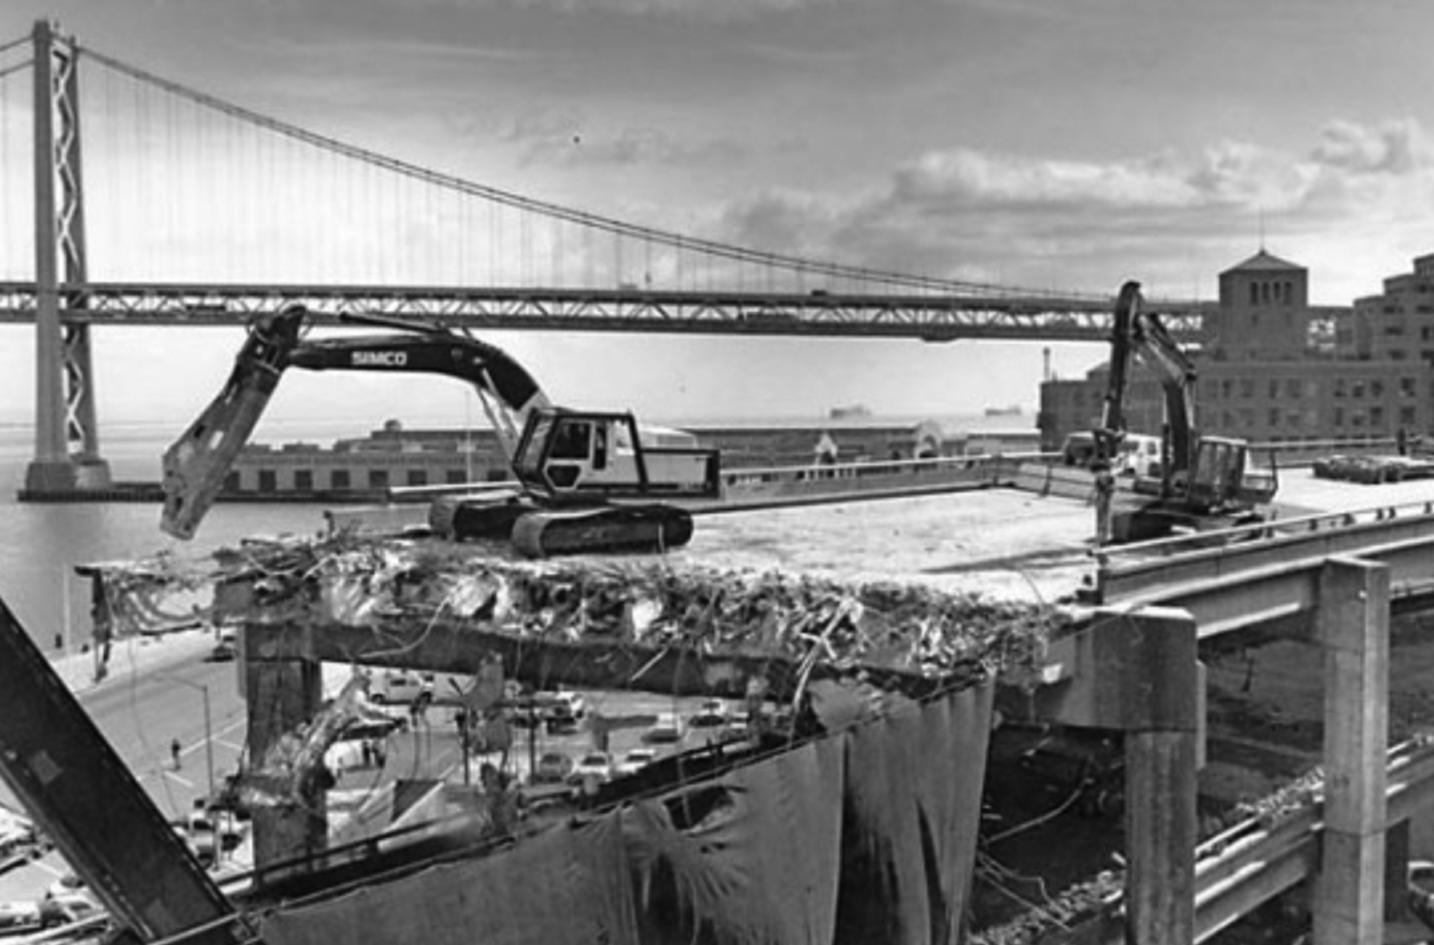 Destruction of the Embarcadero Freeway after the 1989 Loma Prieta Earthquake